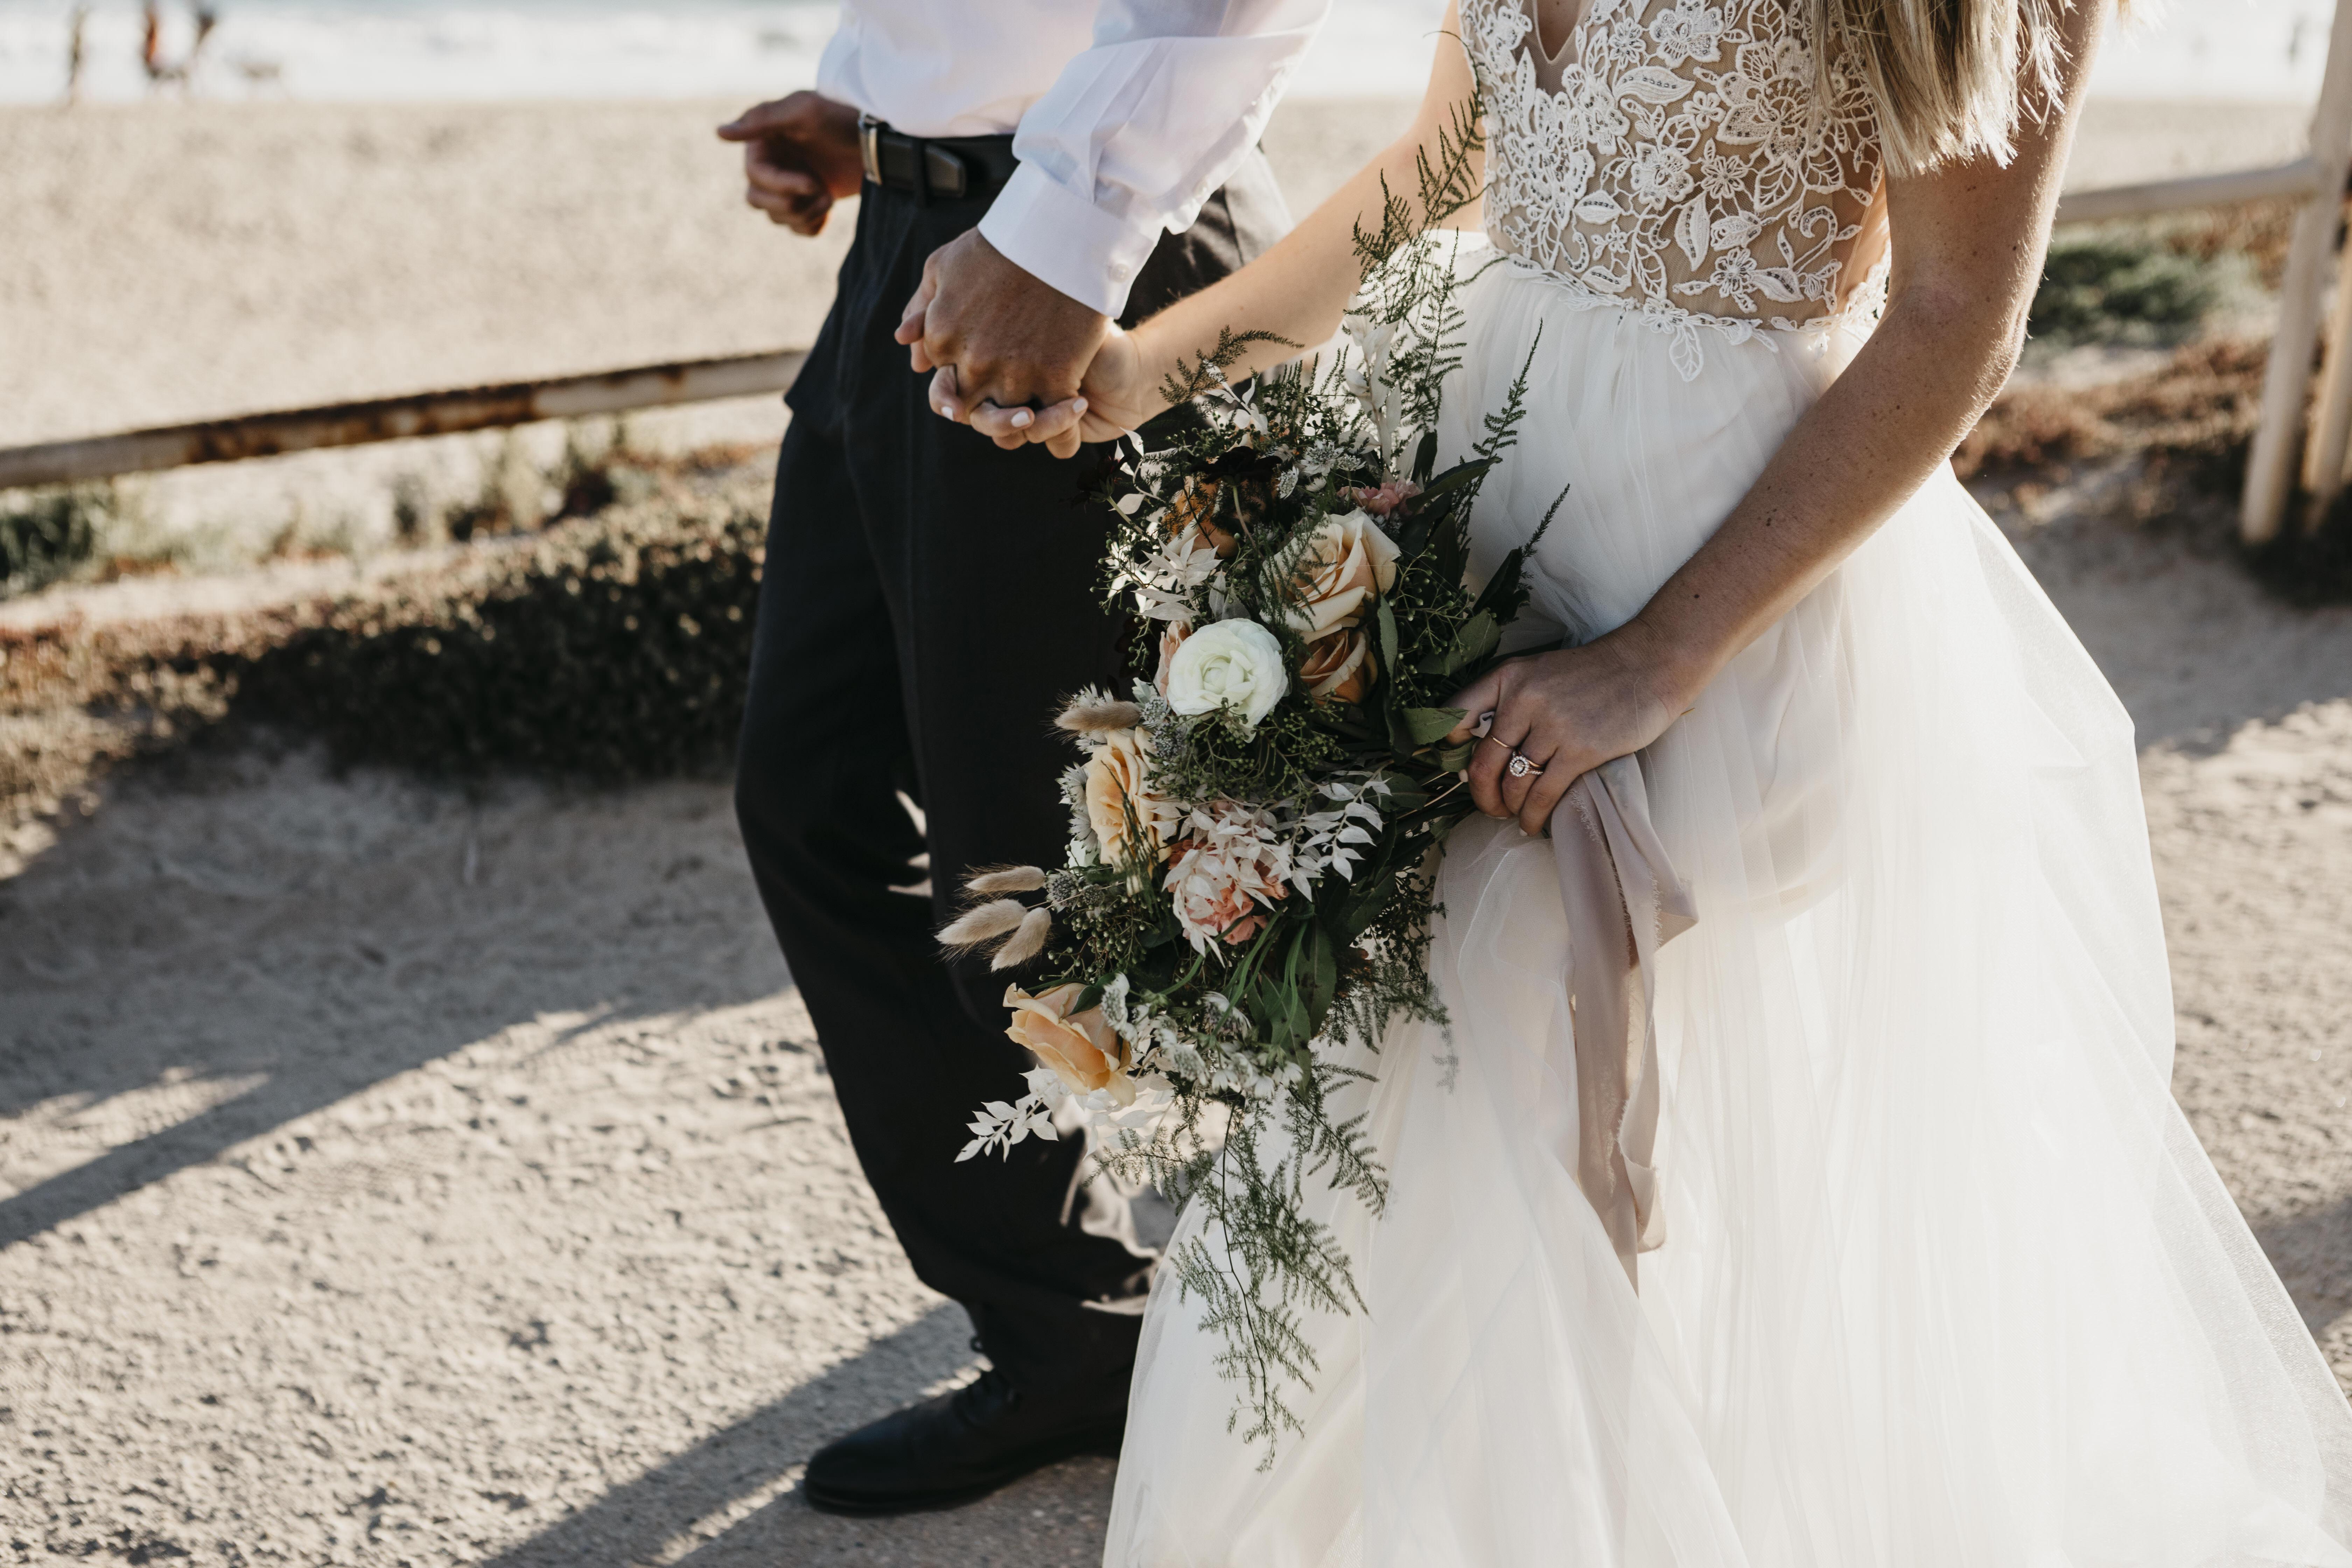 5dsyngeksipjsm,Xhosa Inspired Xhosa Traditional Wedding Dresses For Bridesmaids